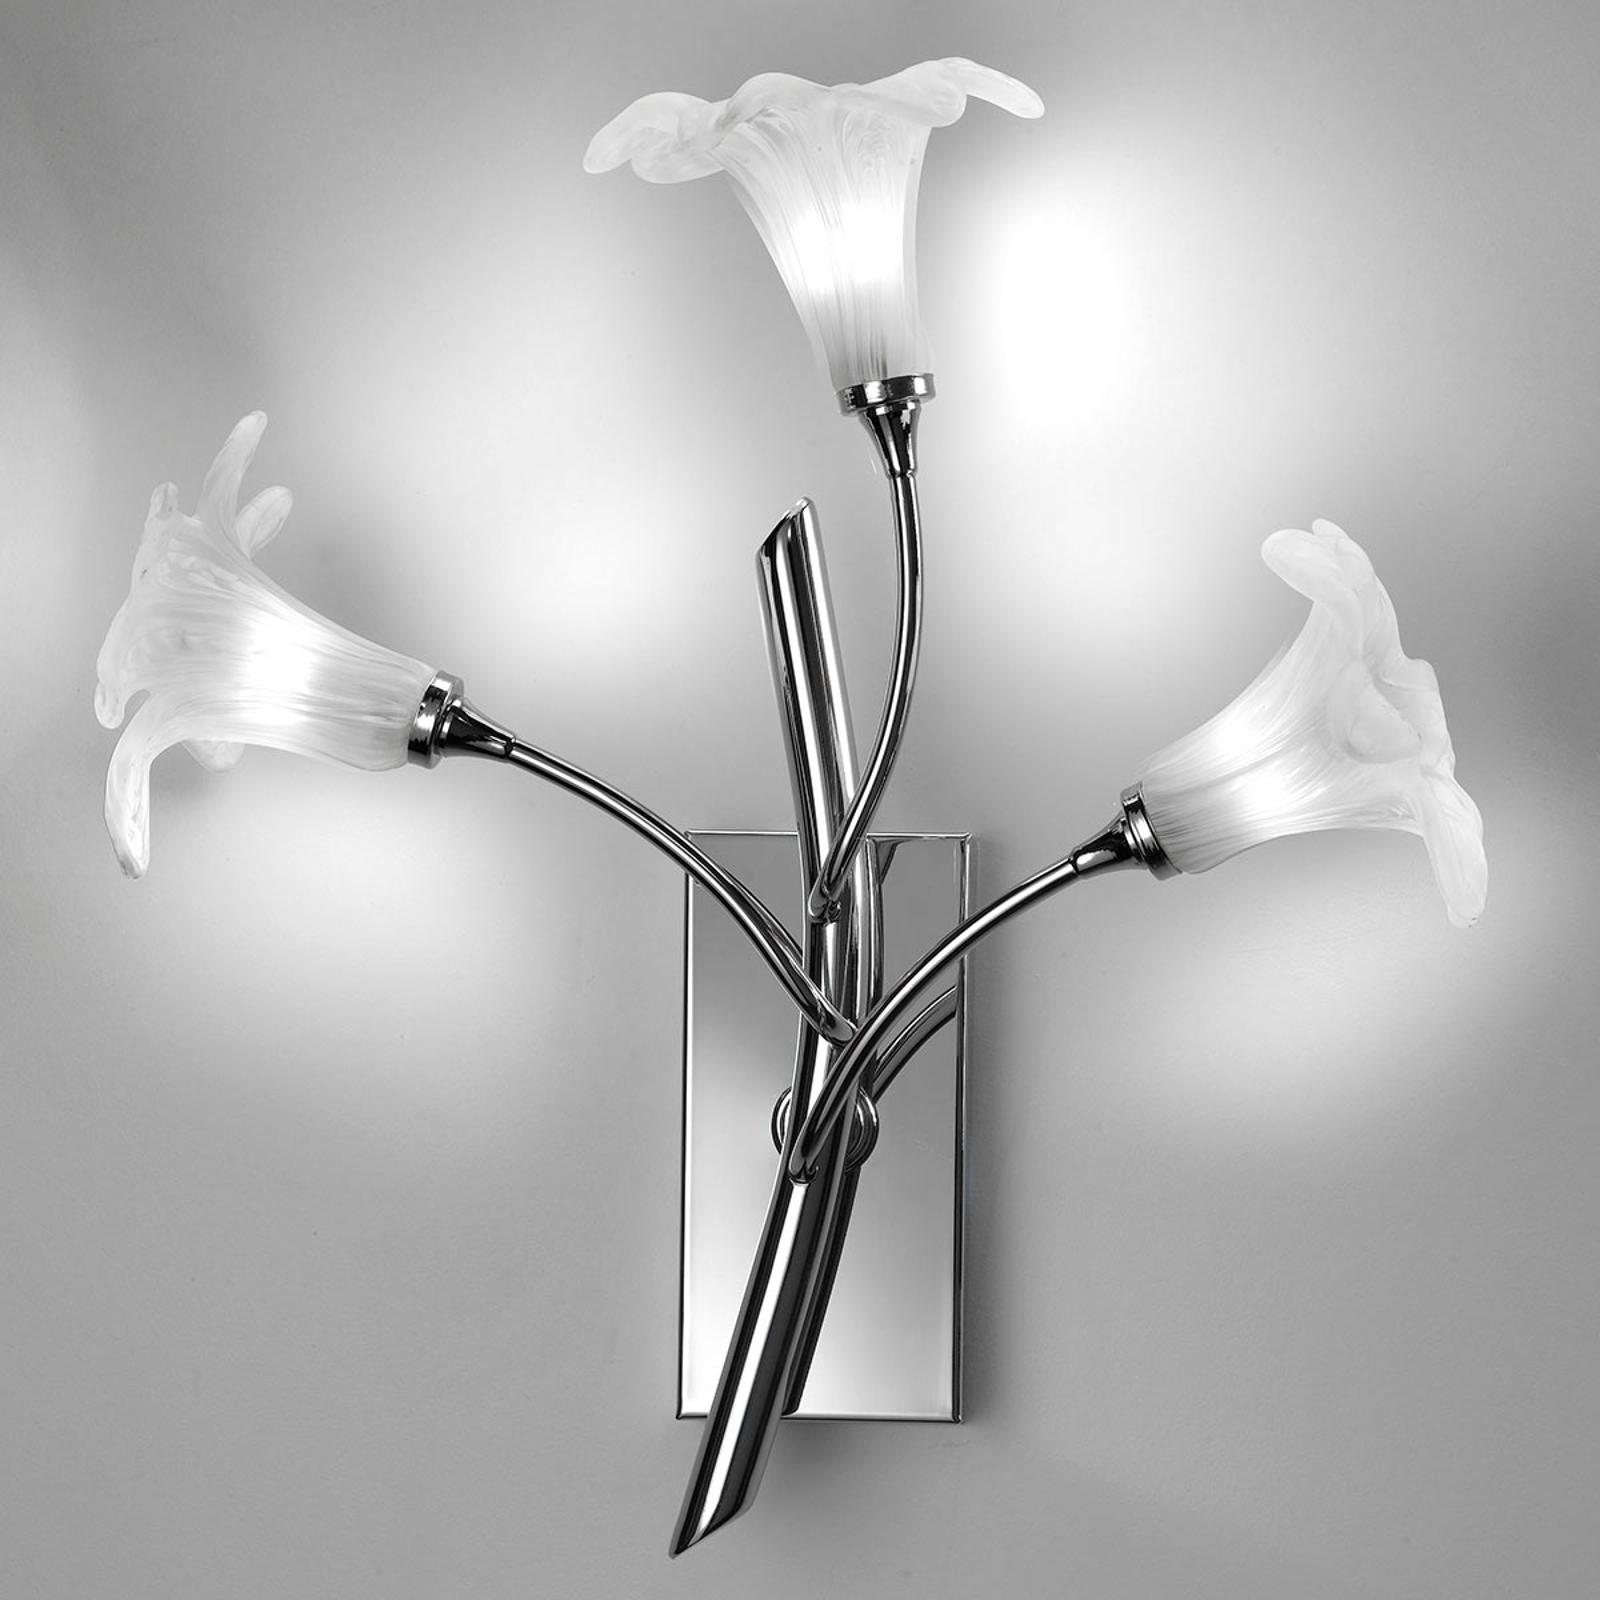 Wandlampe 7142 3-flammig, chrom/klar